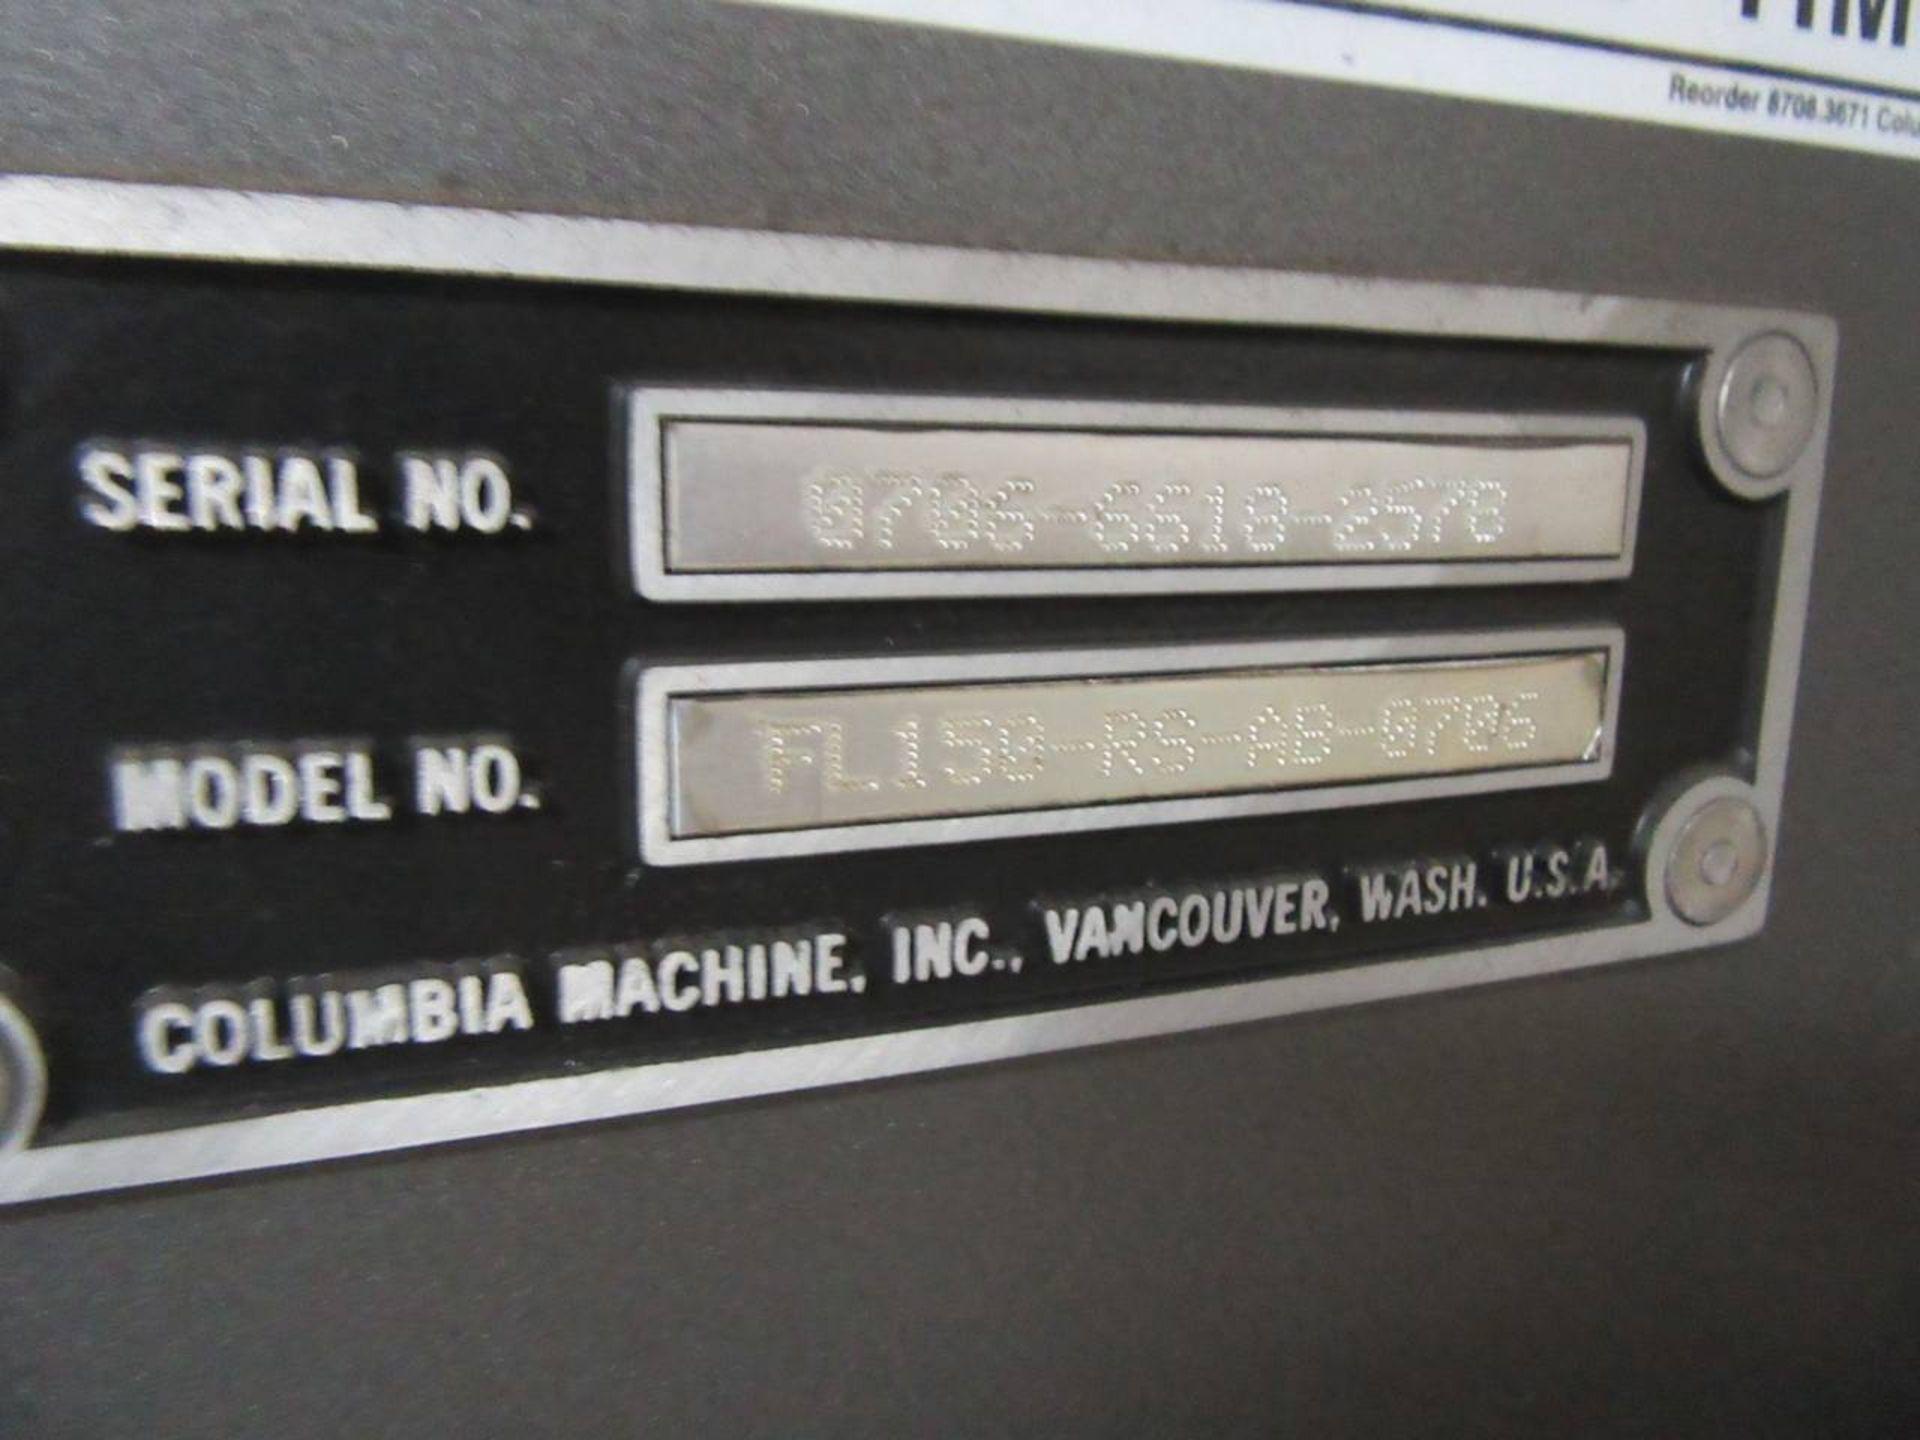 Lot 28 - Columbia FL-150-RS-AB-0706 Palletizer